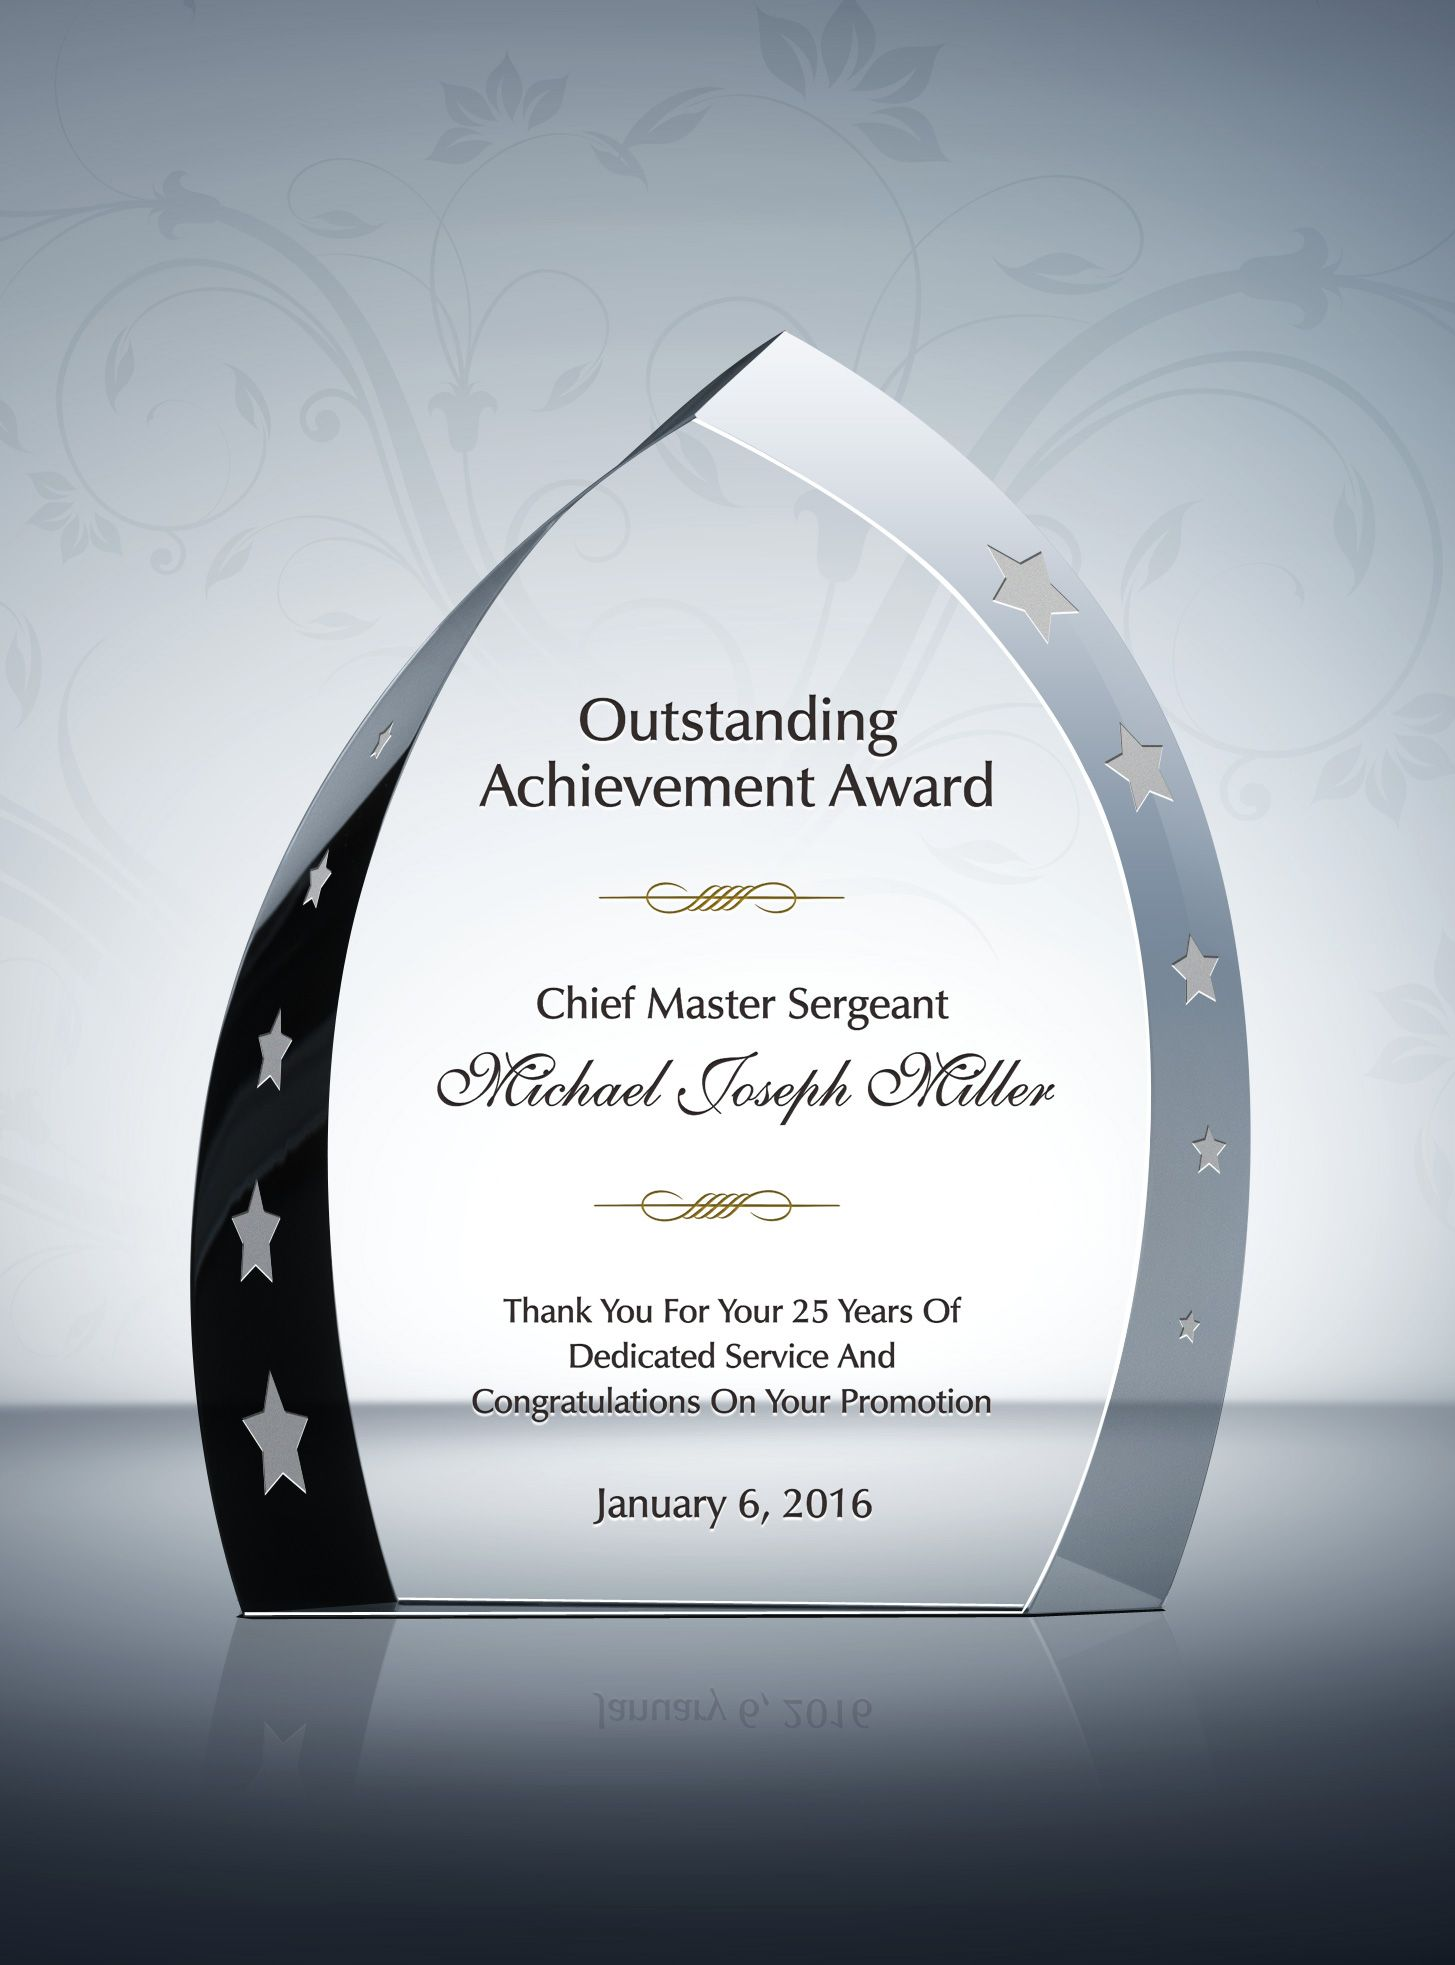 ignite achievement award